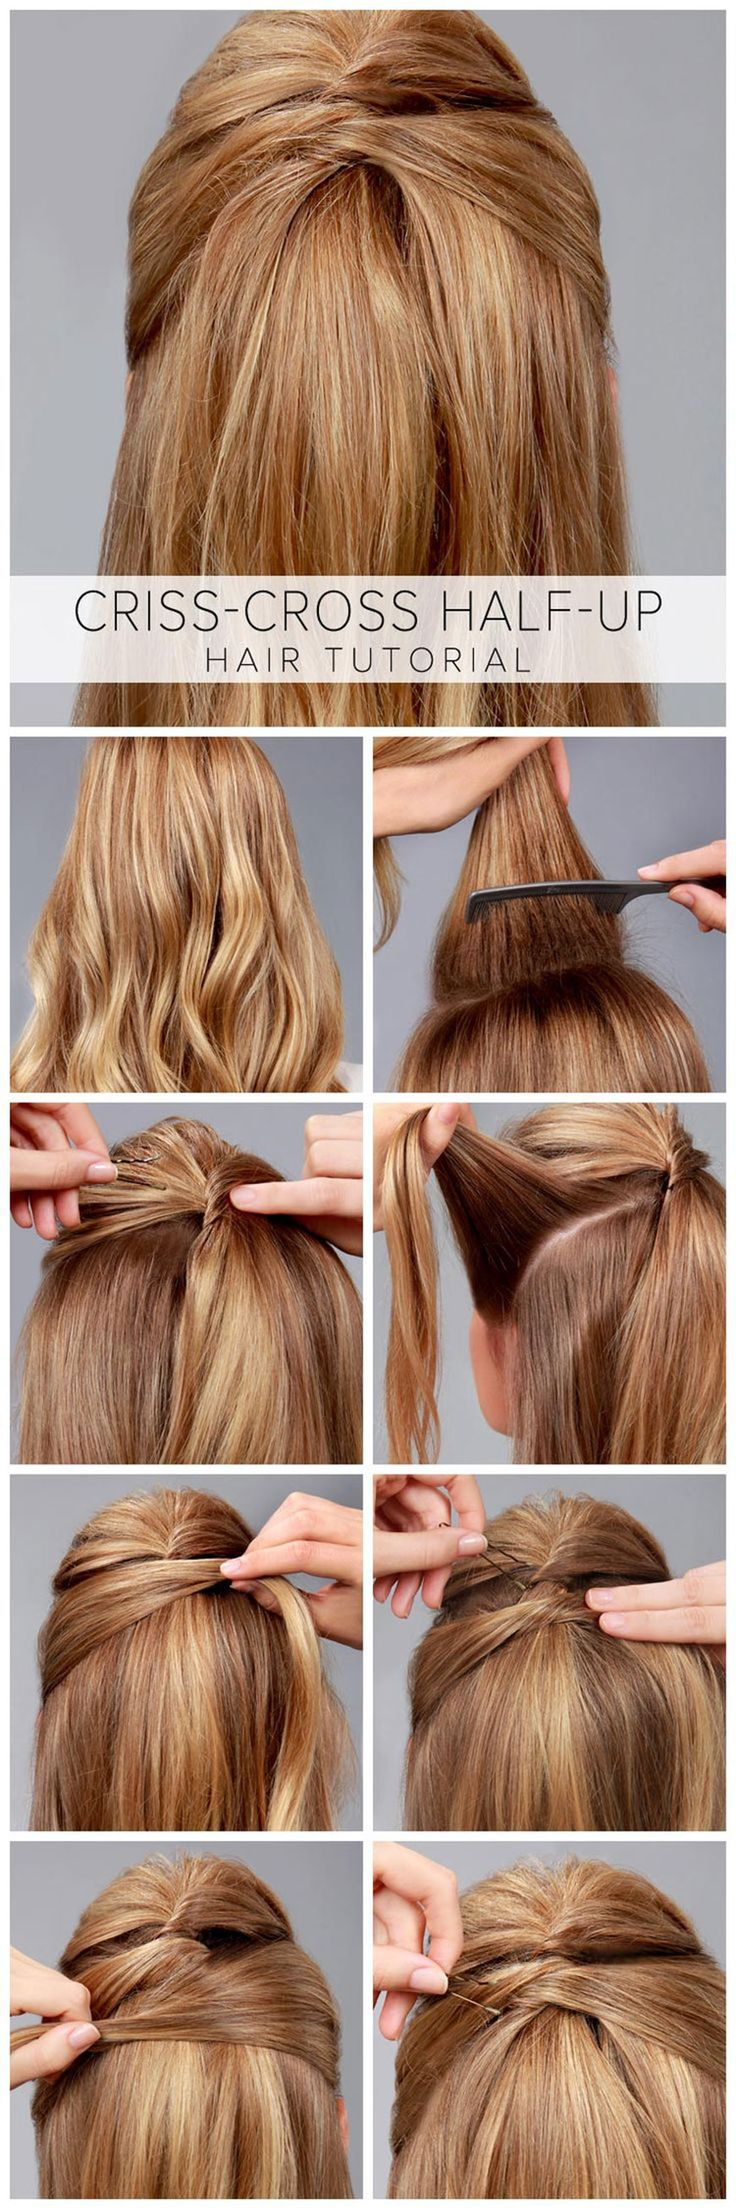 9 Easy, Pretty Summer Styles for Long Hair - SELF